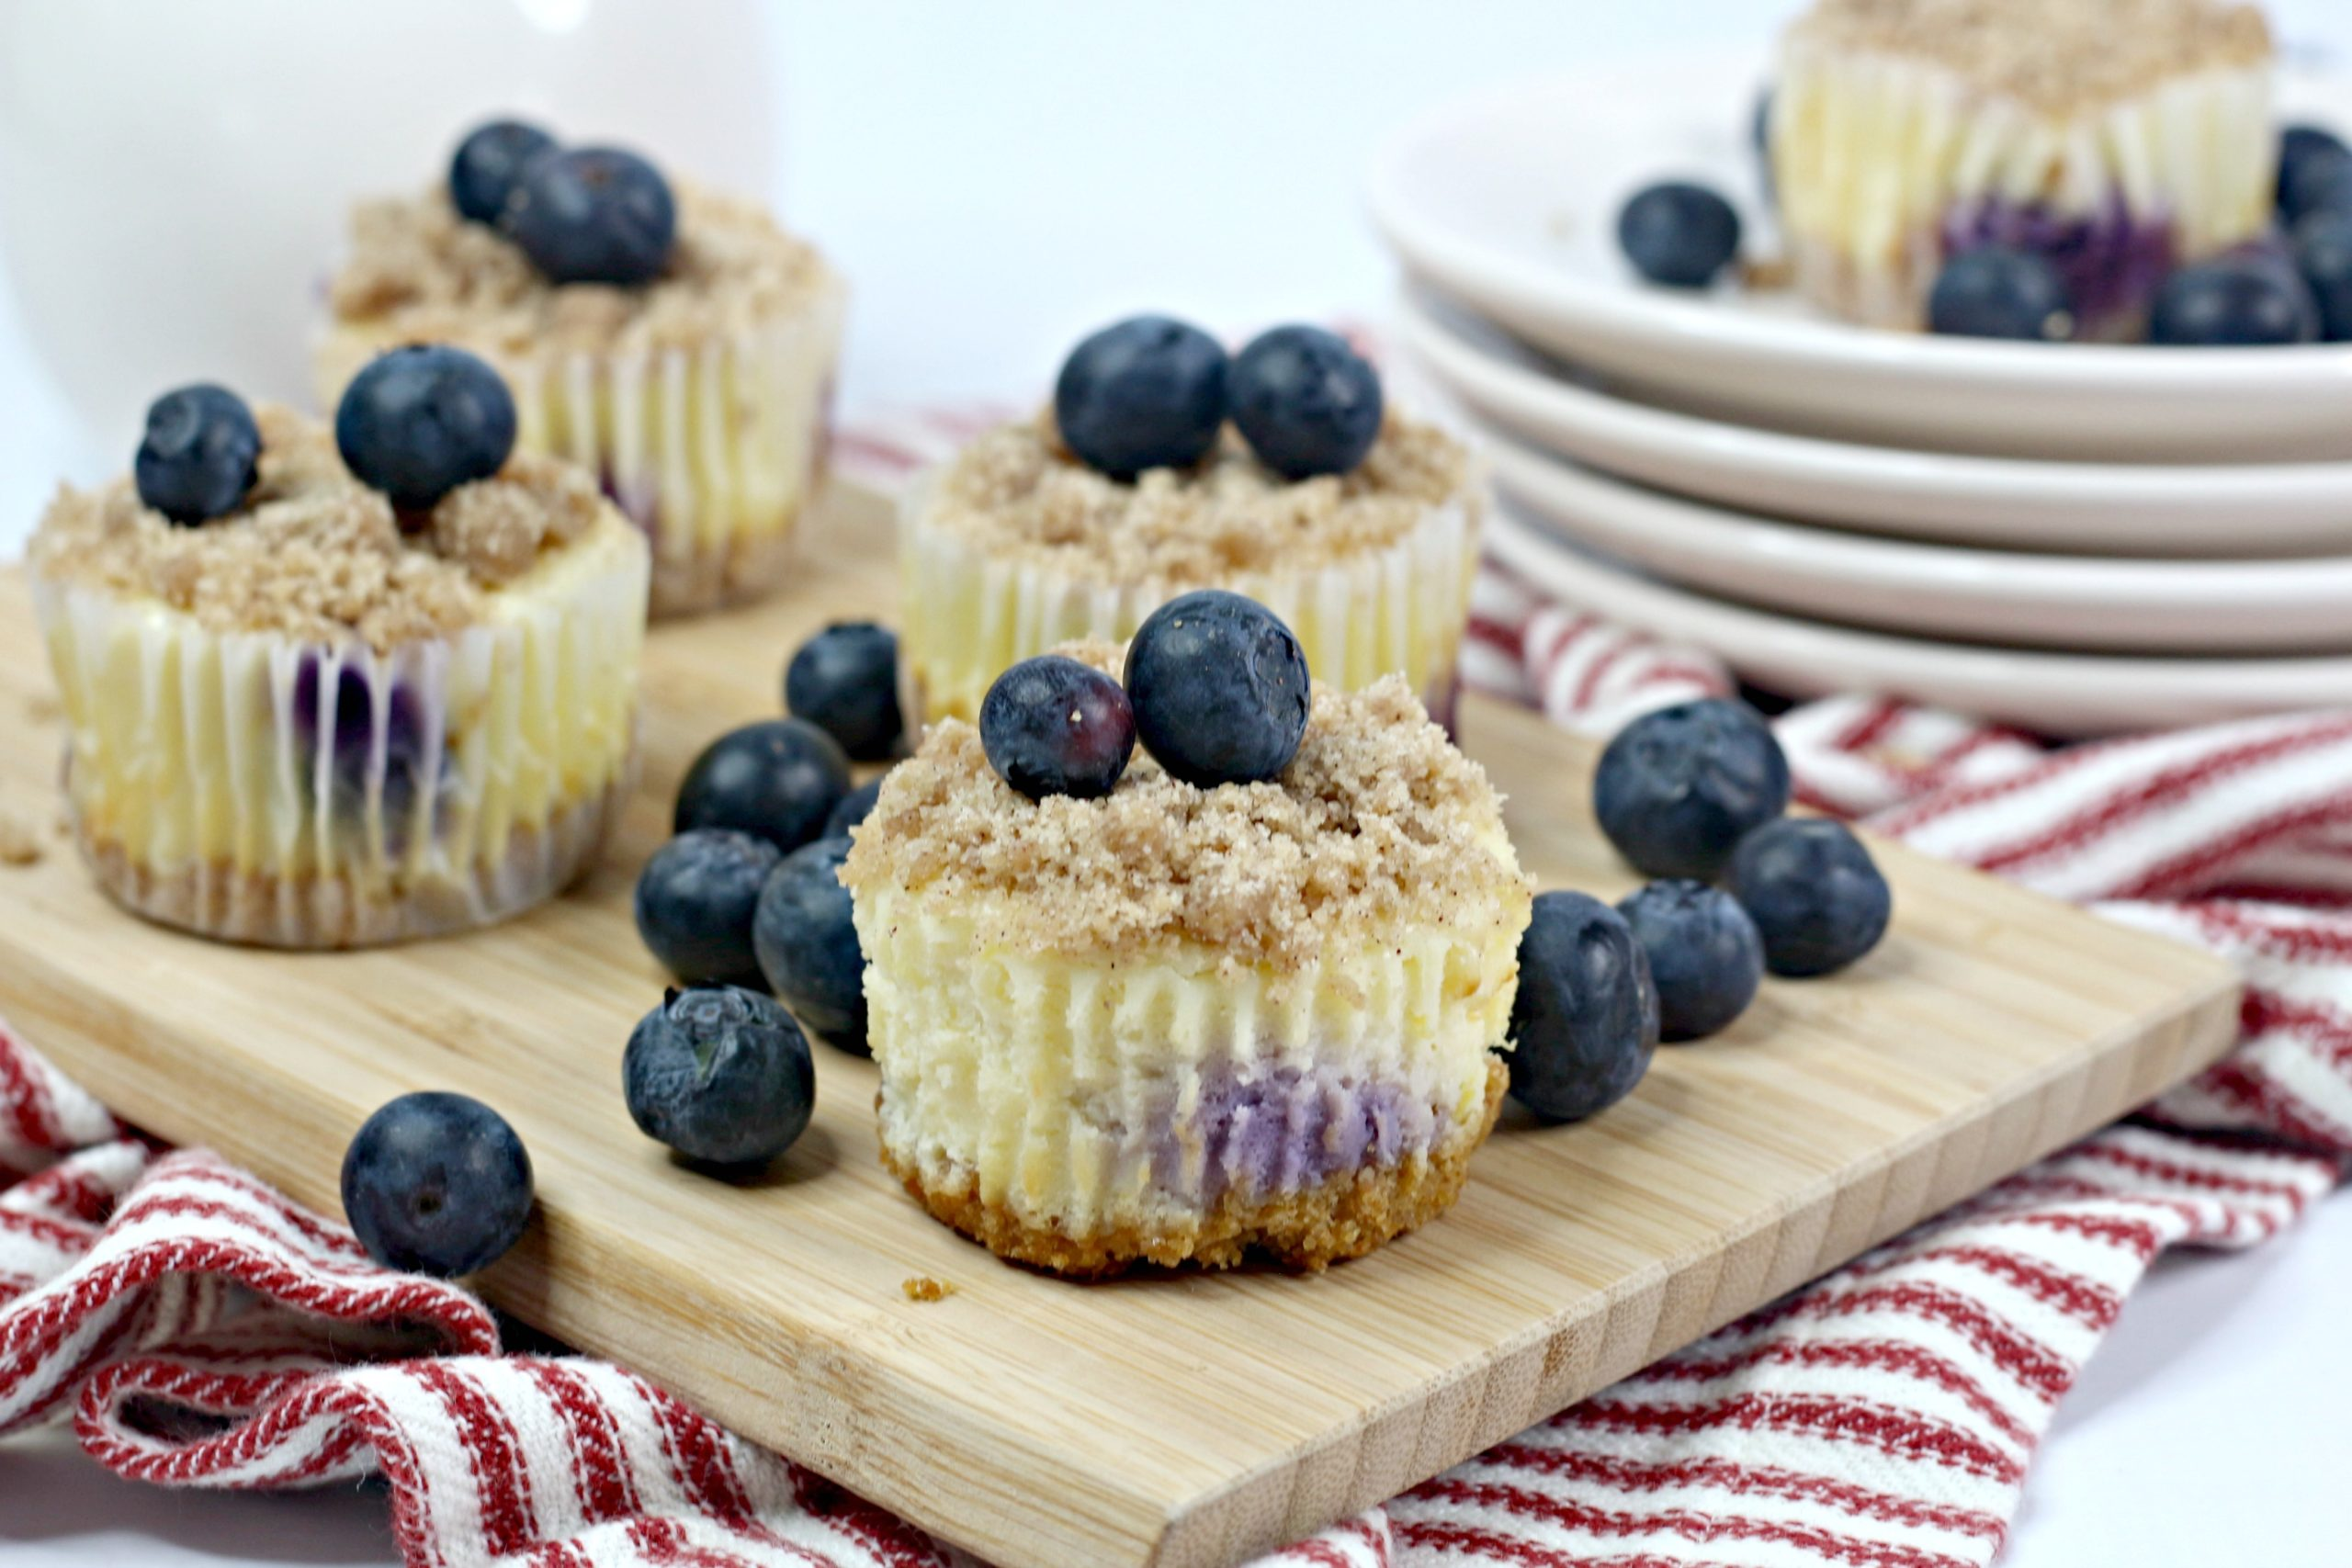 Blueberry Cheesecake Crumble